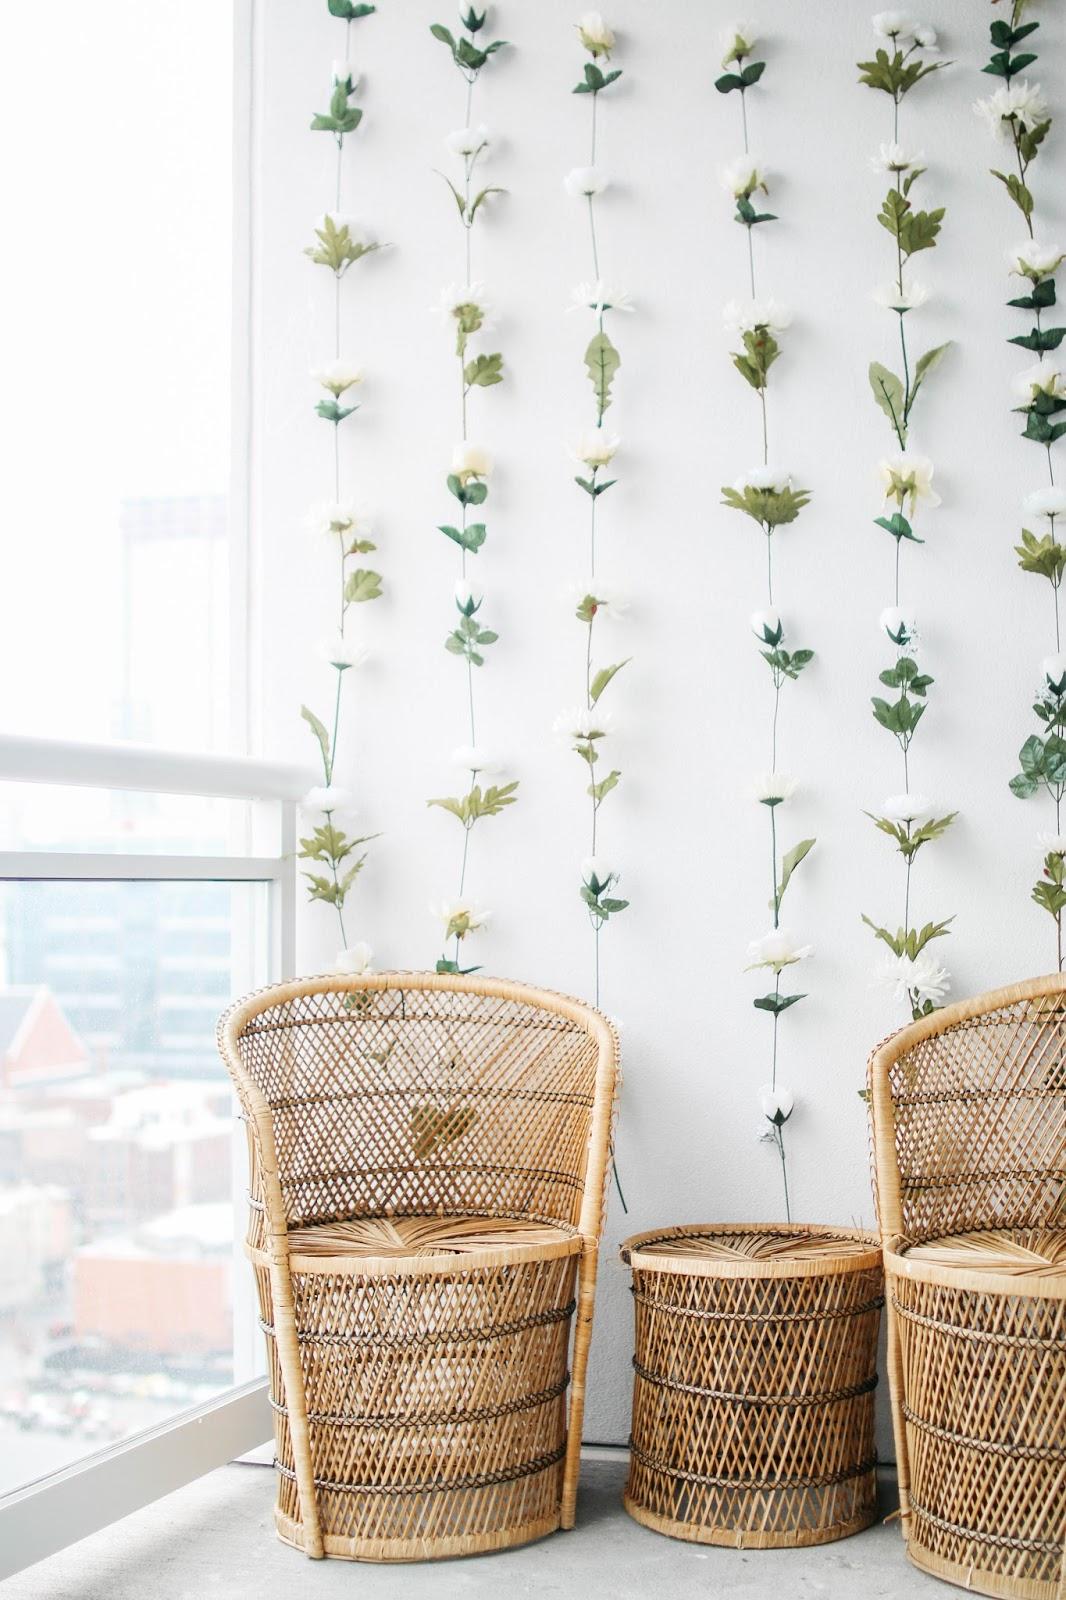 Diy Wall Flowers: DIY Instagram Flower Wall